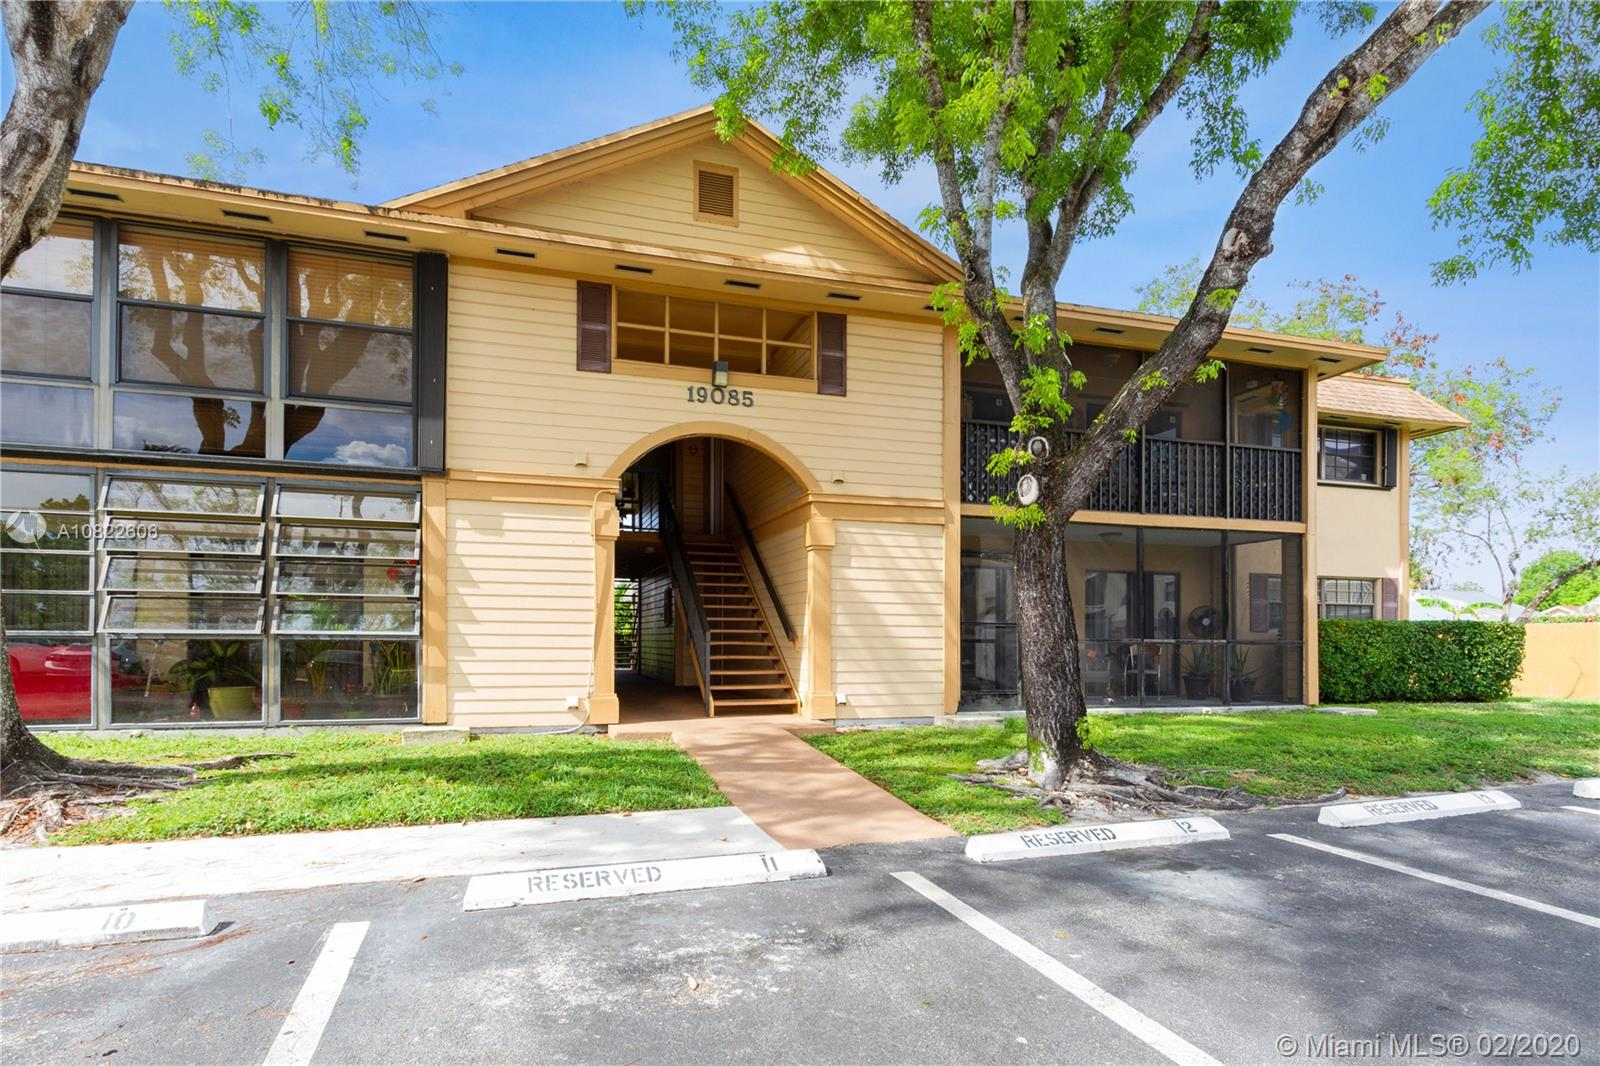 19085 NW 62nd Ave #107, Hialeah, FL 33015 - Hialeah, FL real estate listing